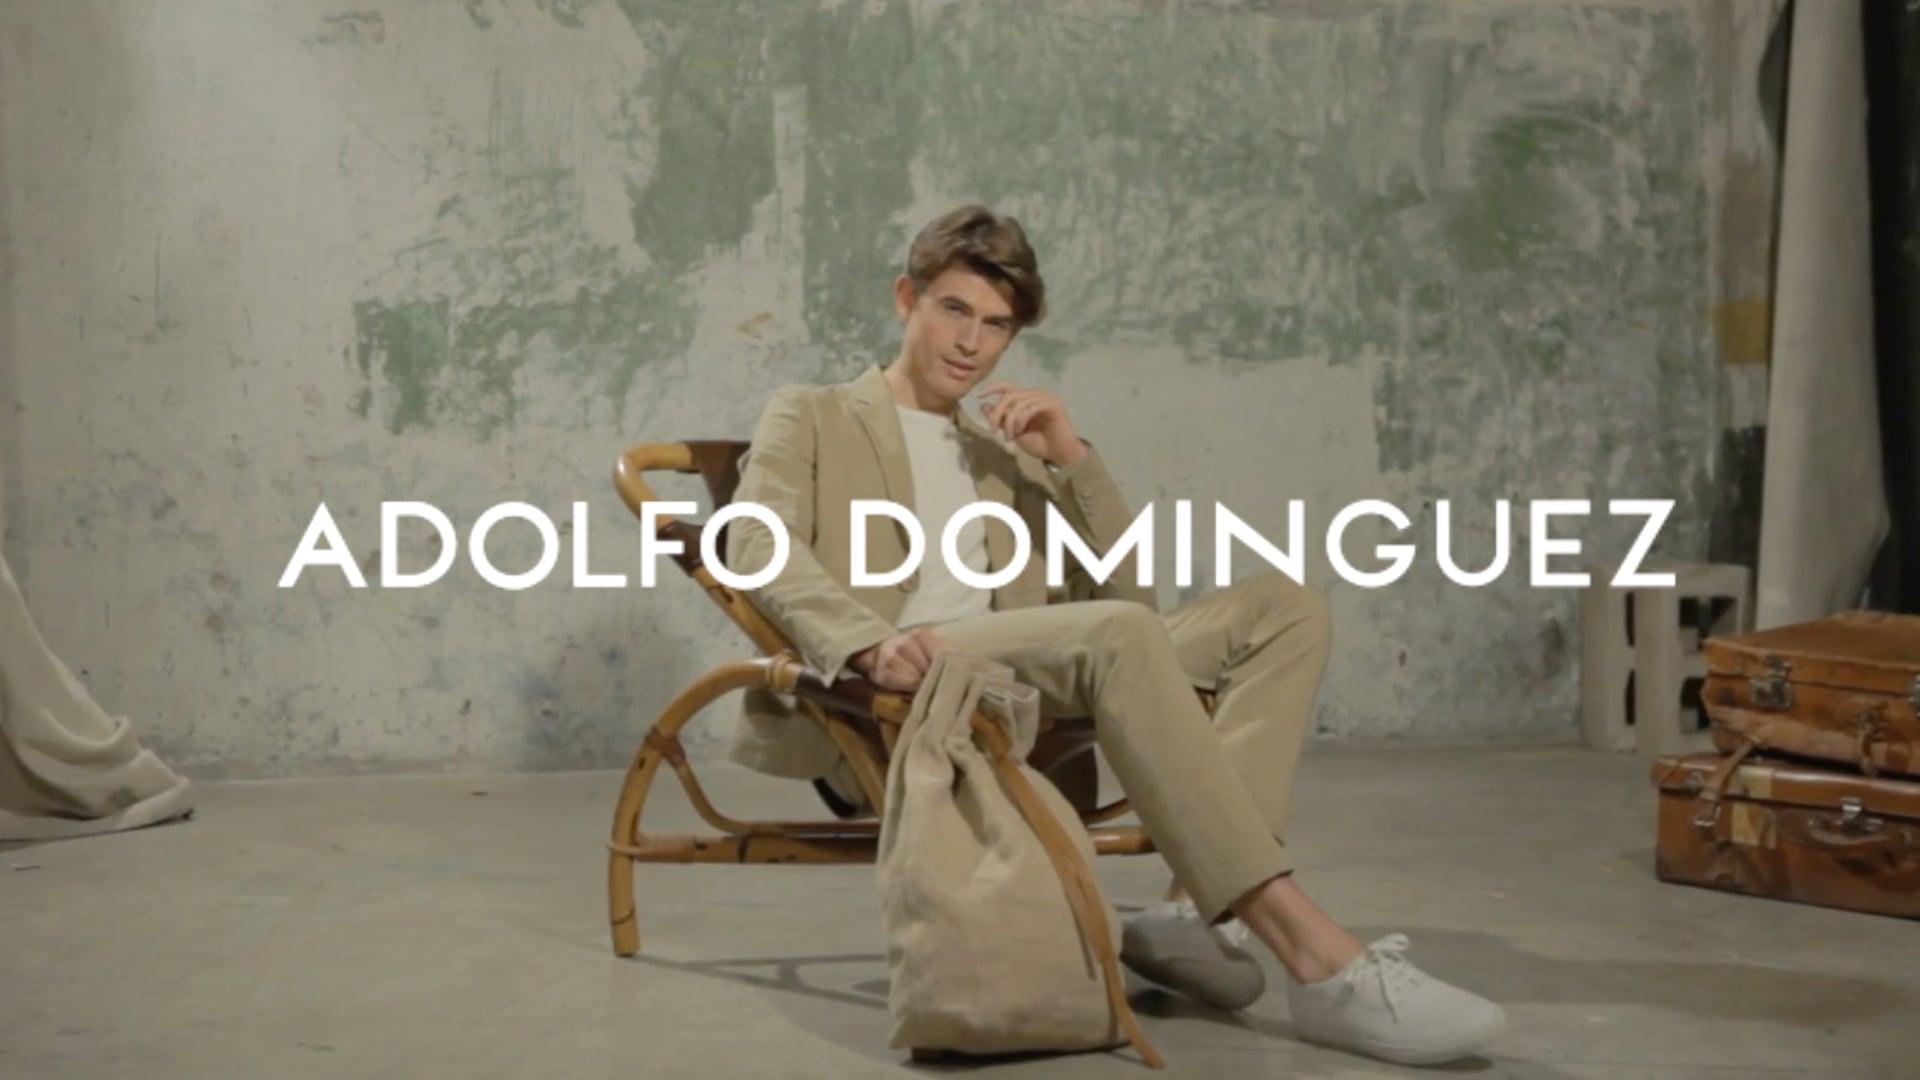 Adolfo Dominguez SS 2016 Man Campaing